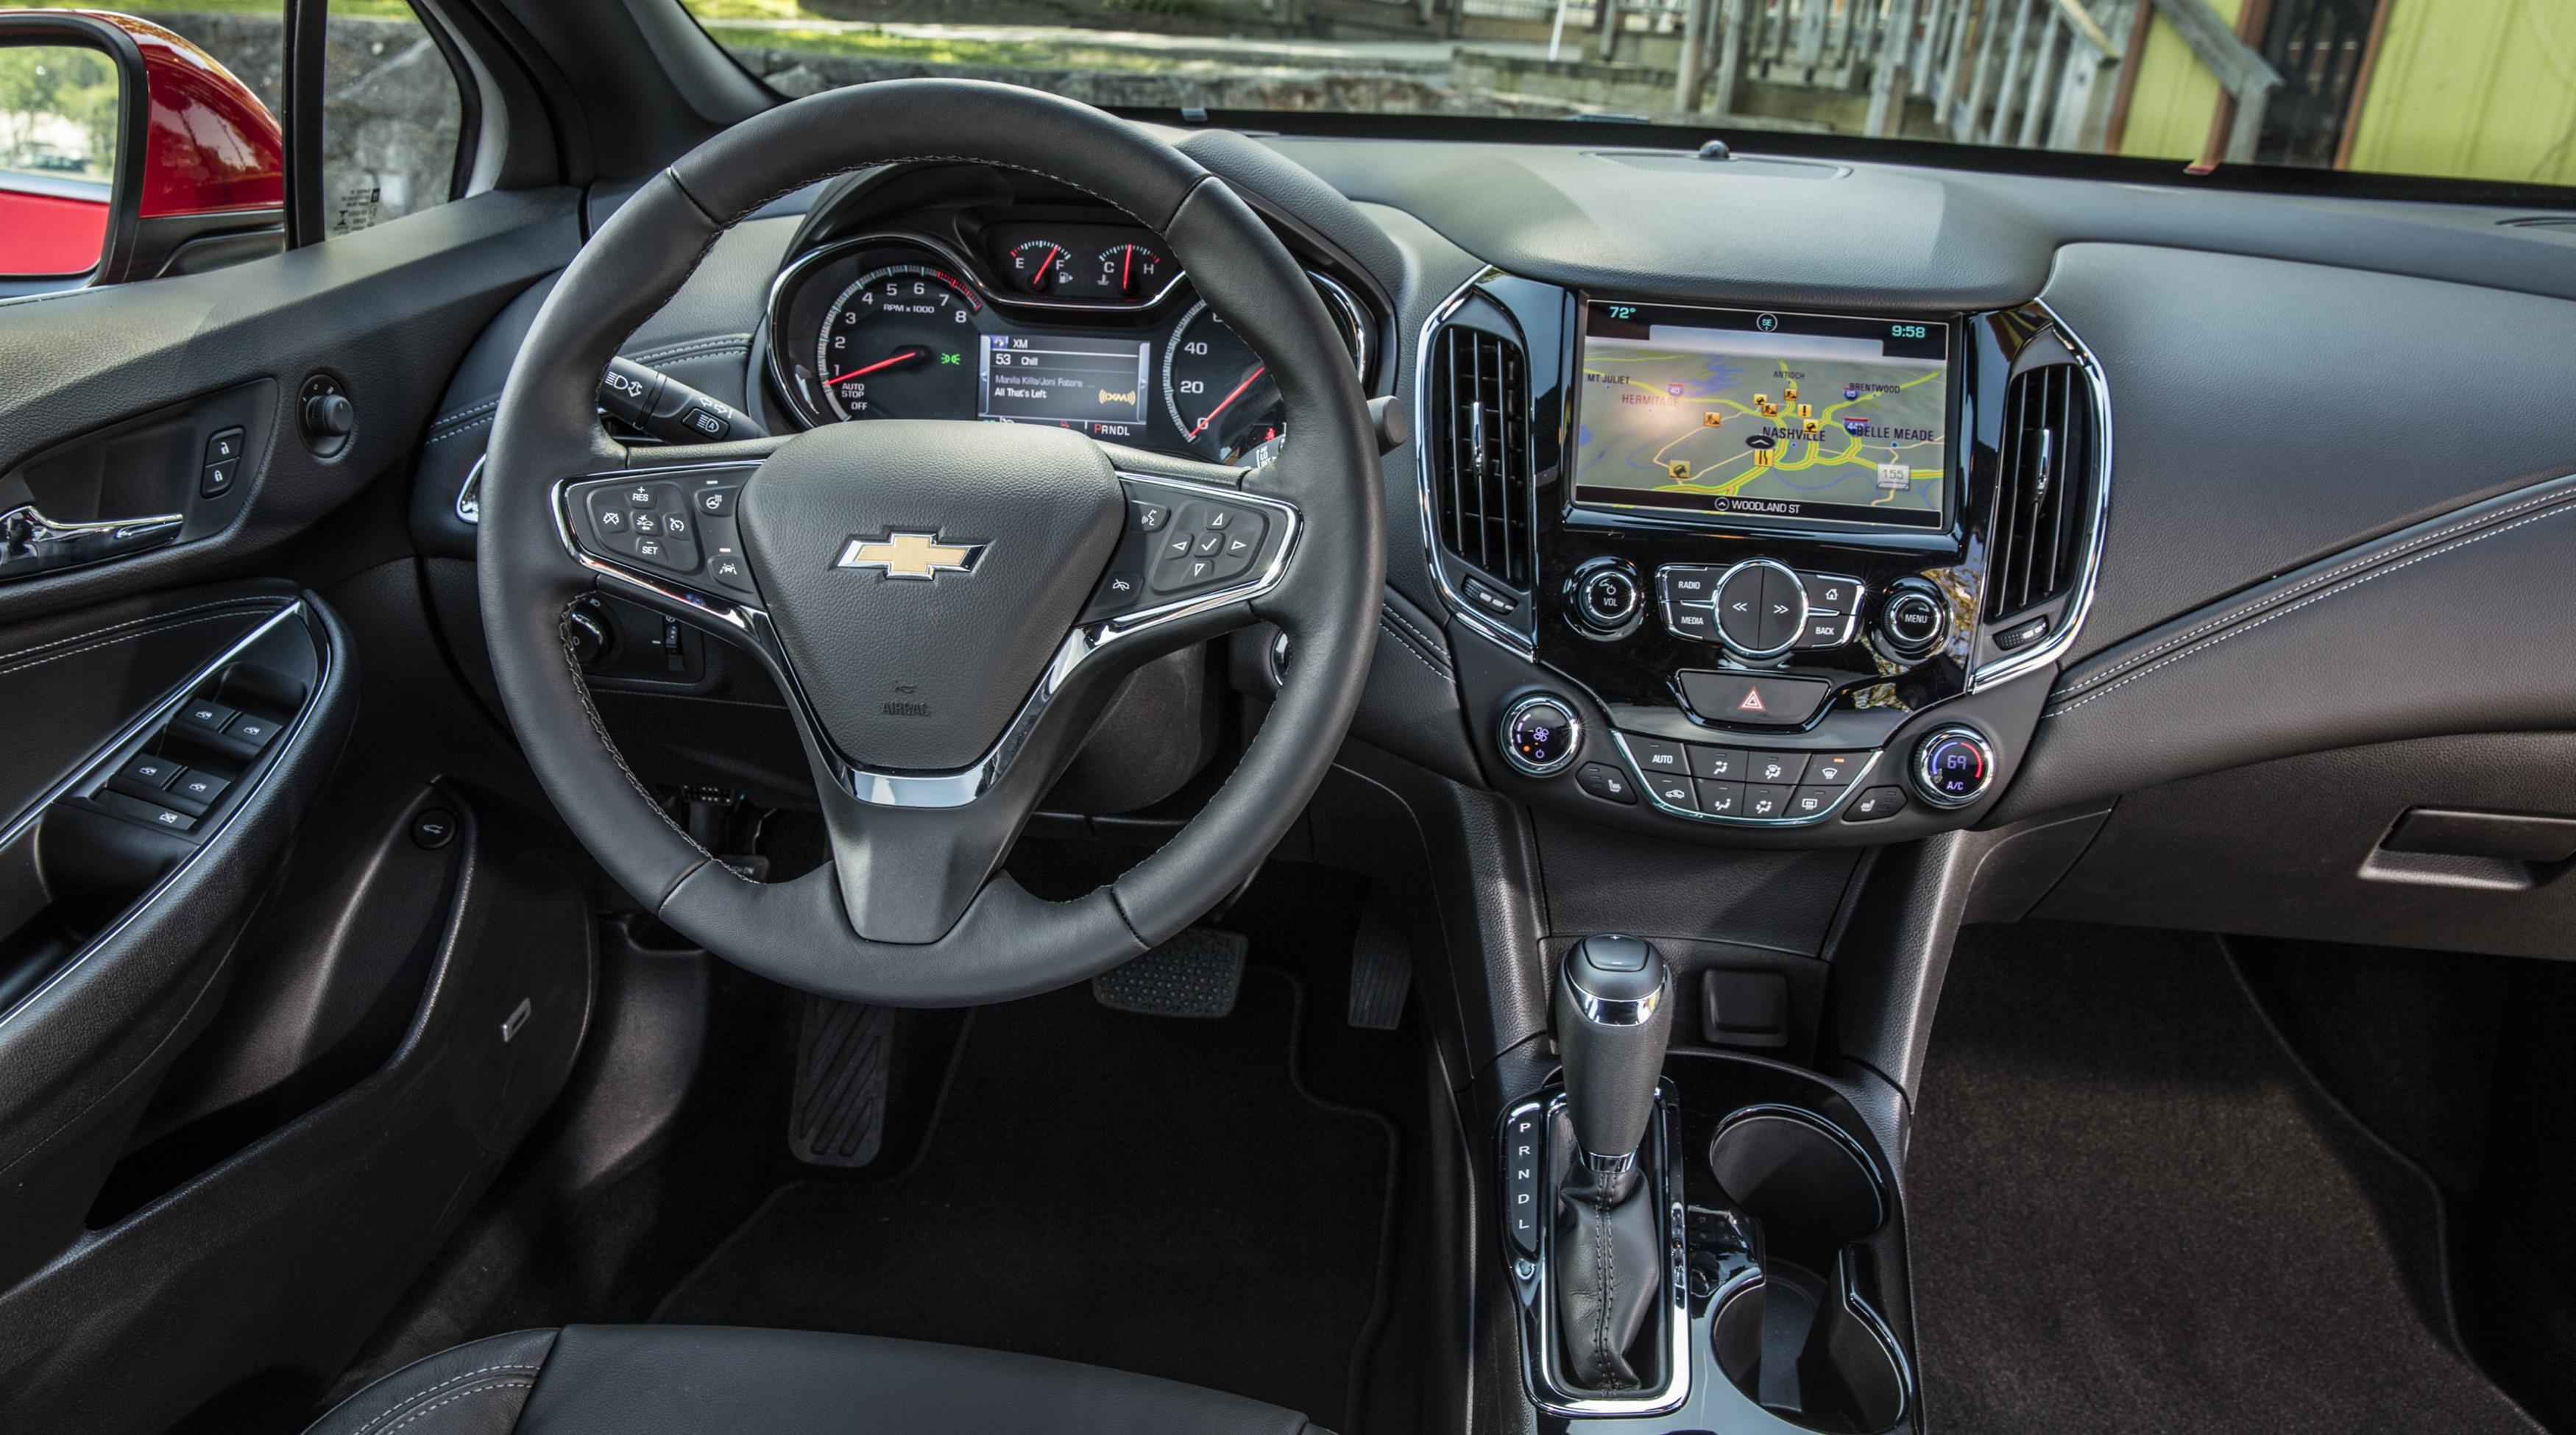 2016-Chevrolet-Cruze-033.jpg